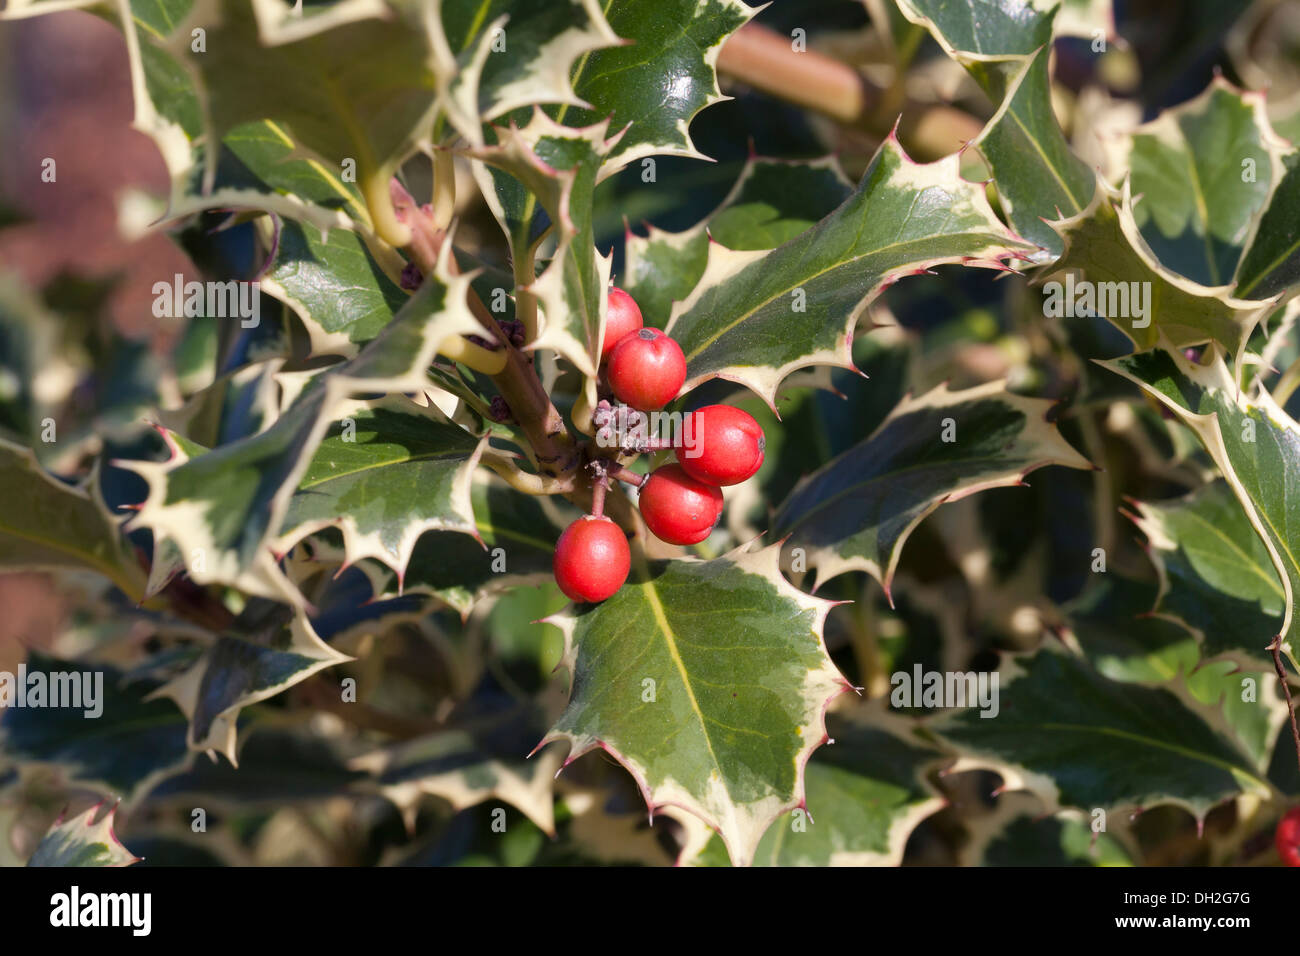 English Holly Ilex Aquifolium Stock Photos & English Holly